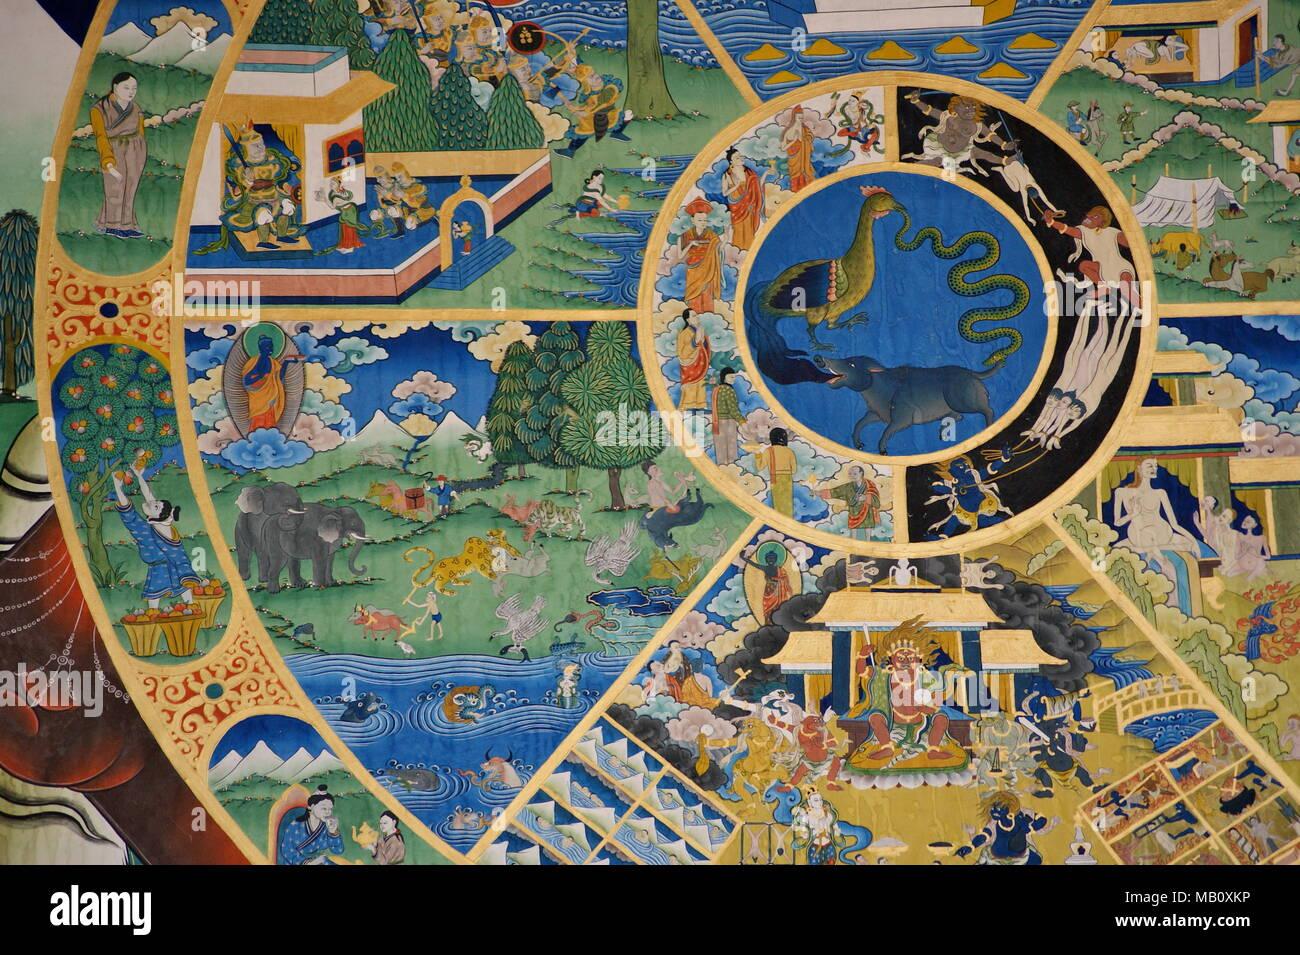 Punakha dzong mural in Bhutan - Stock Image